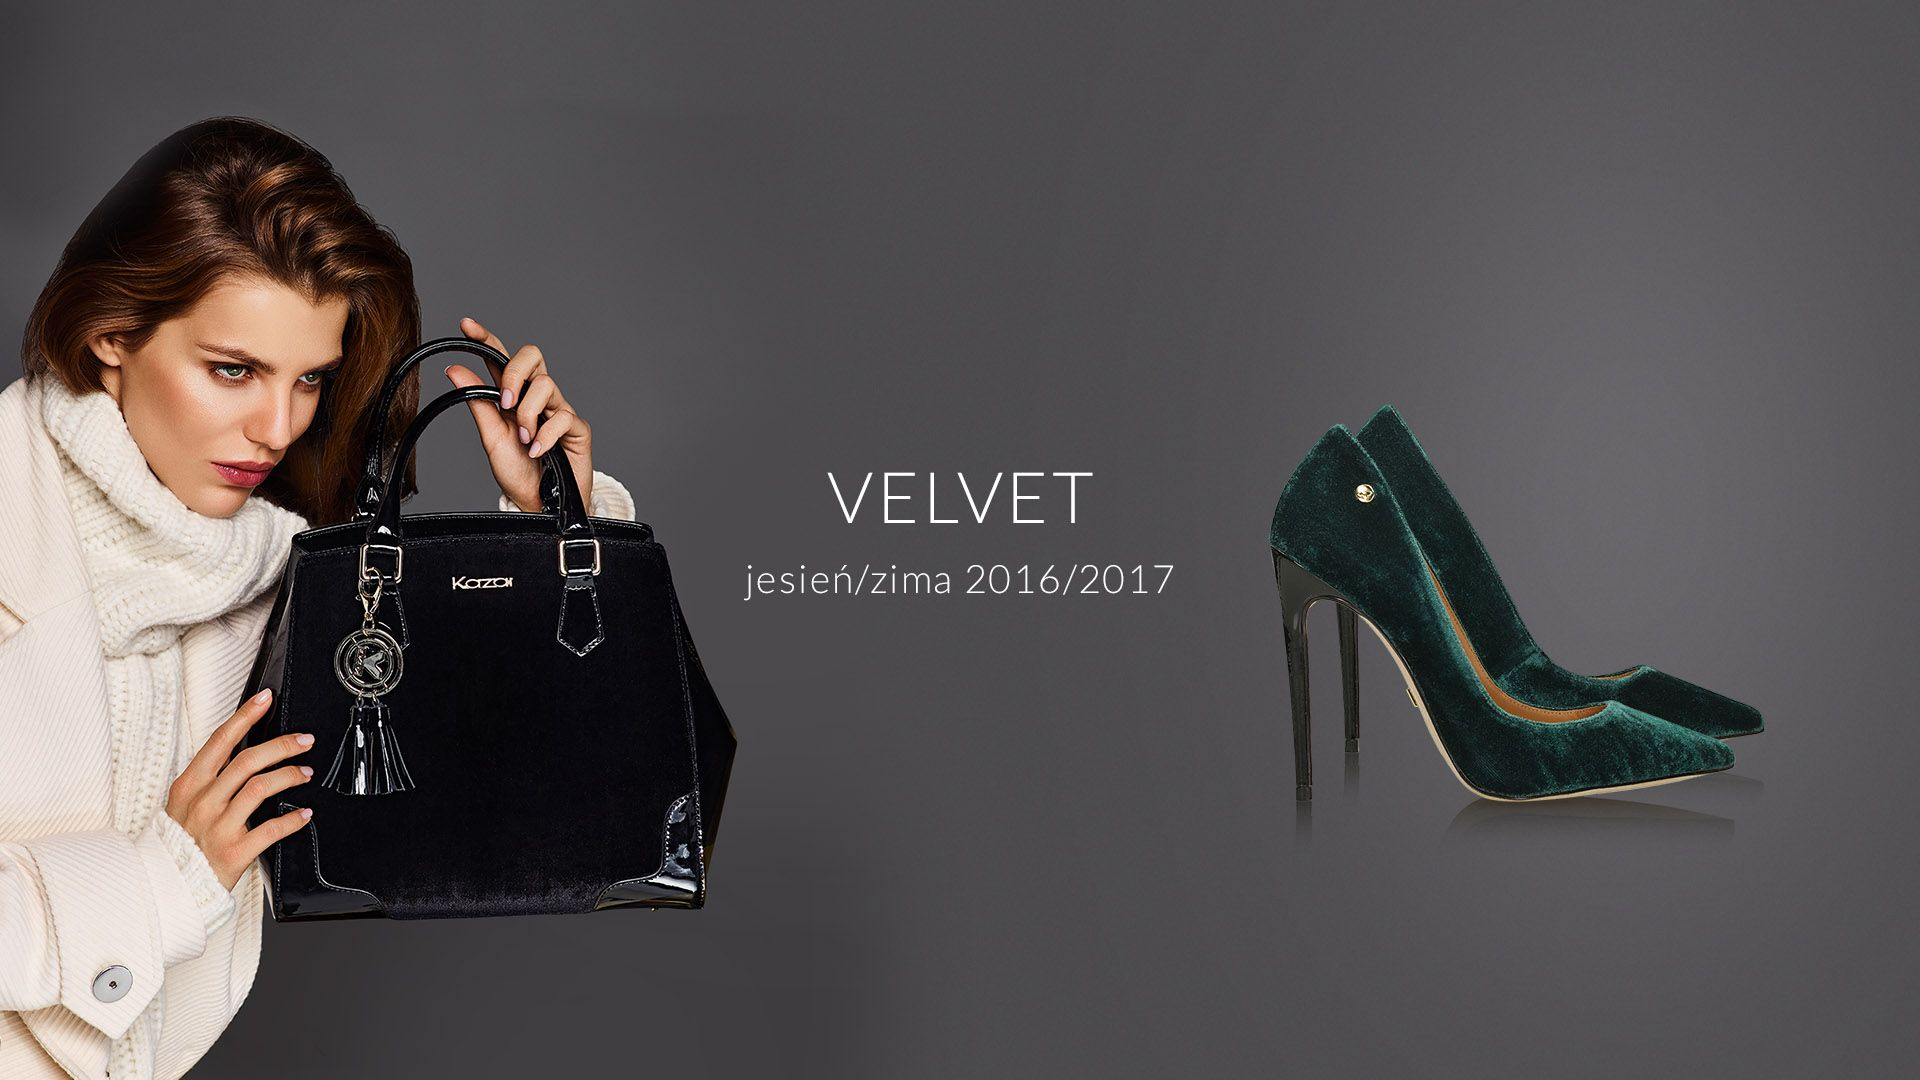 Kazar Footwear Elegant Accessories Fashion Leather Accessories